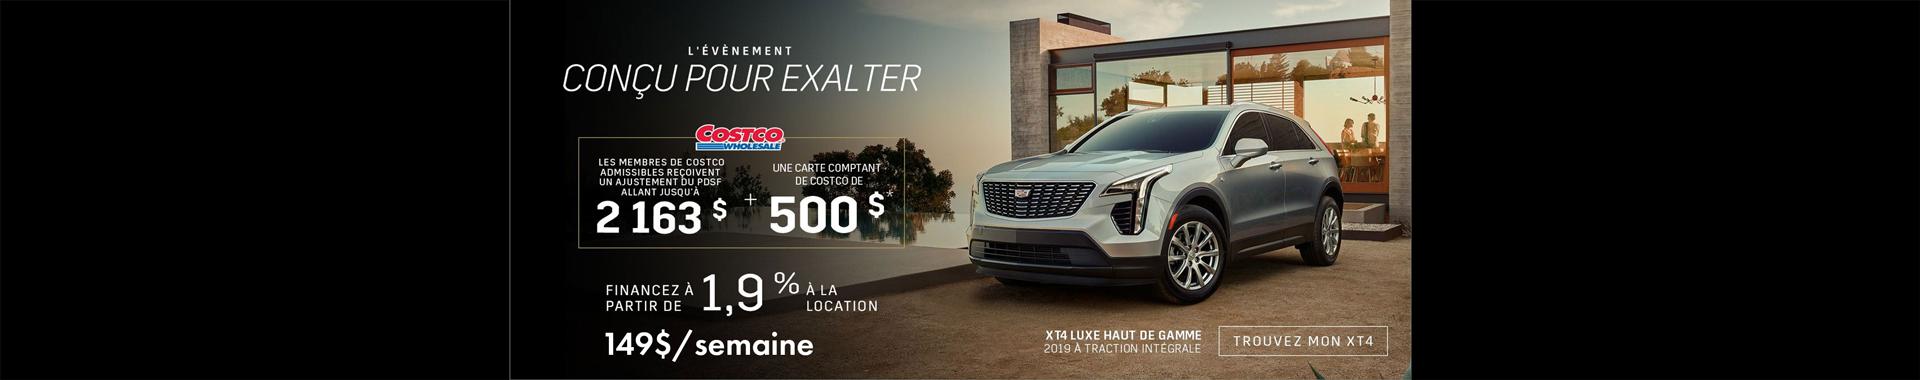 Cadillac XT4 - Aout 2019